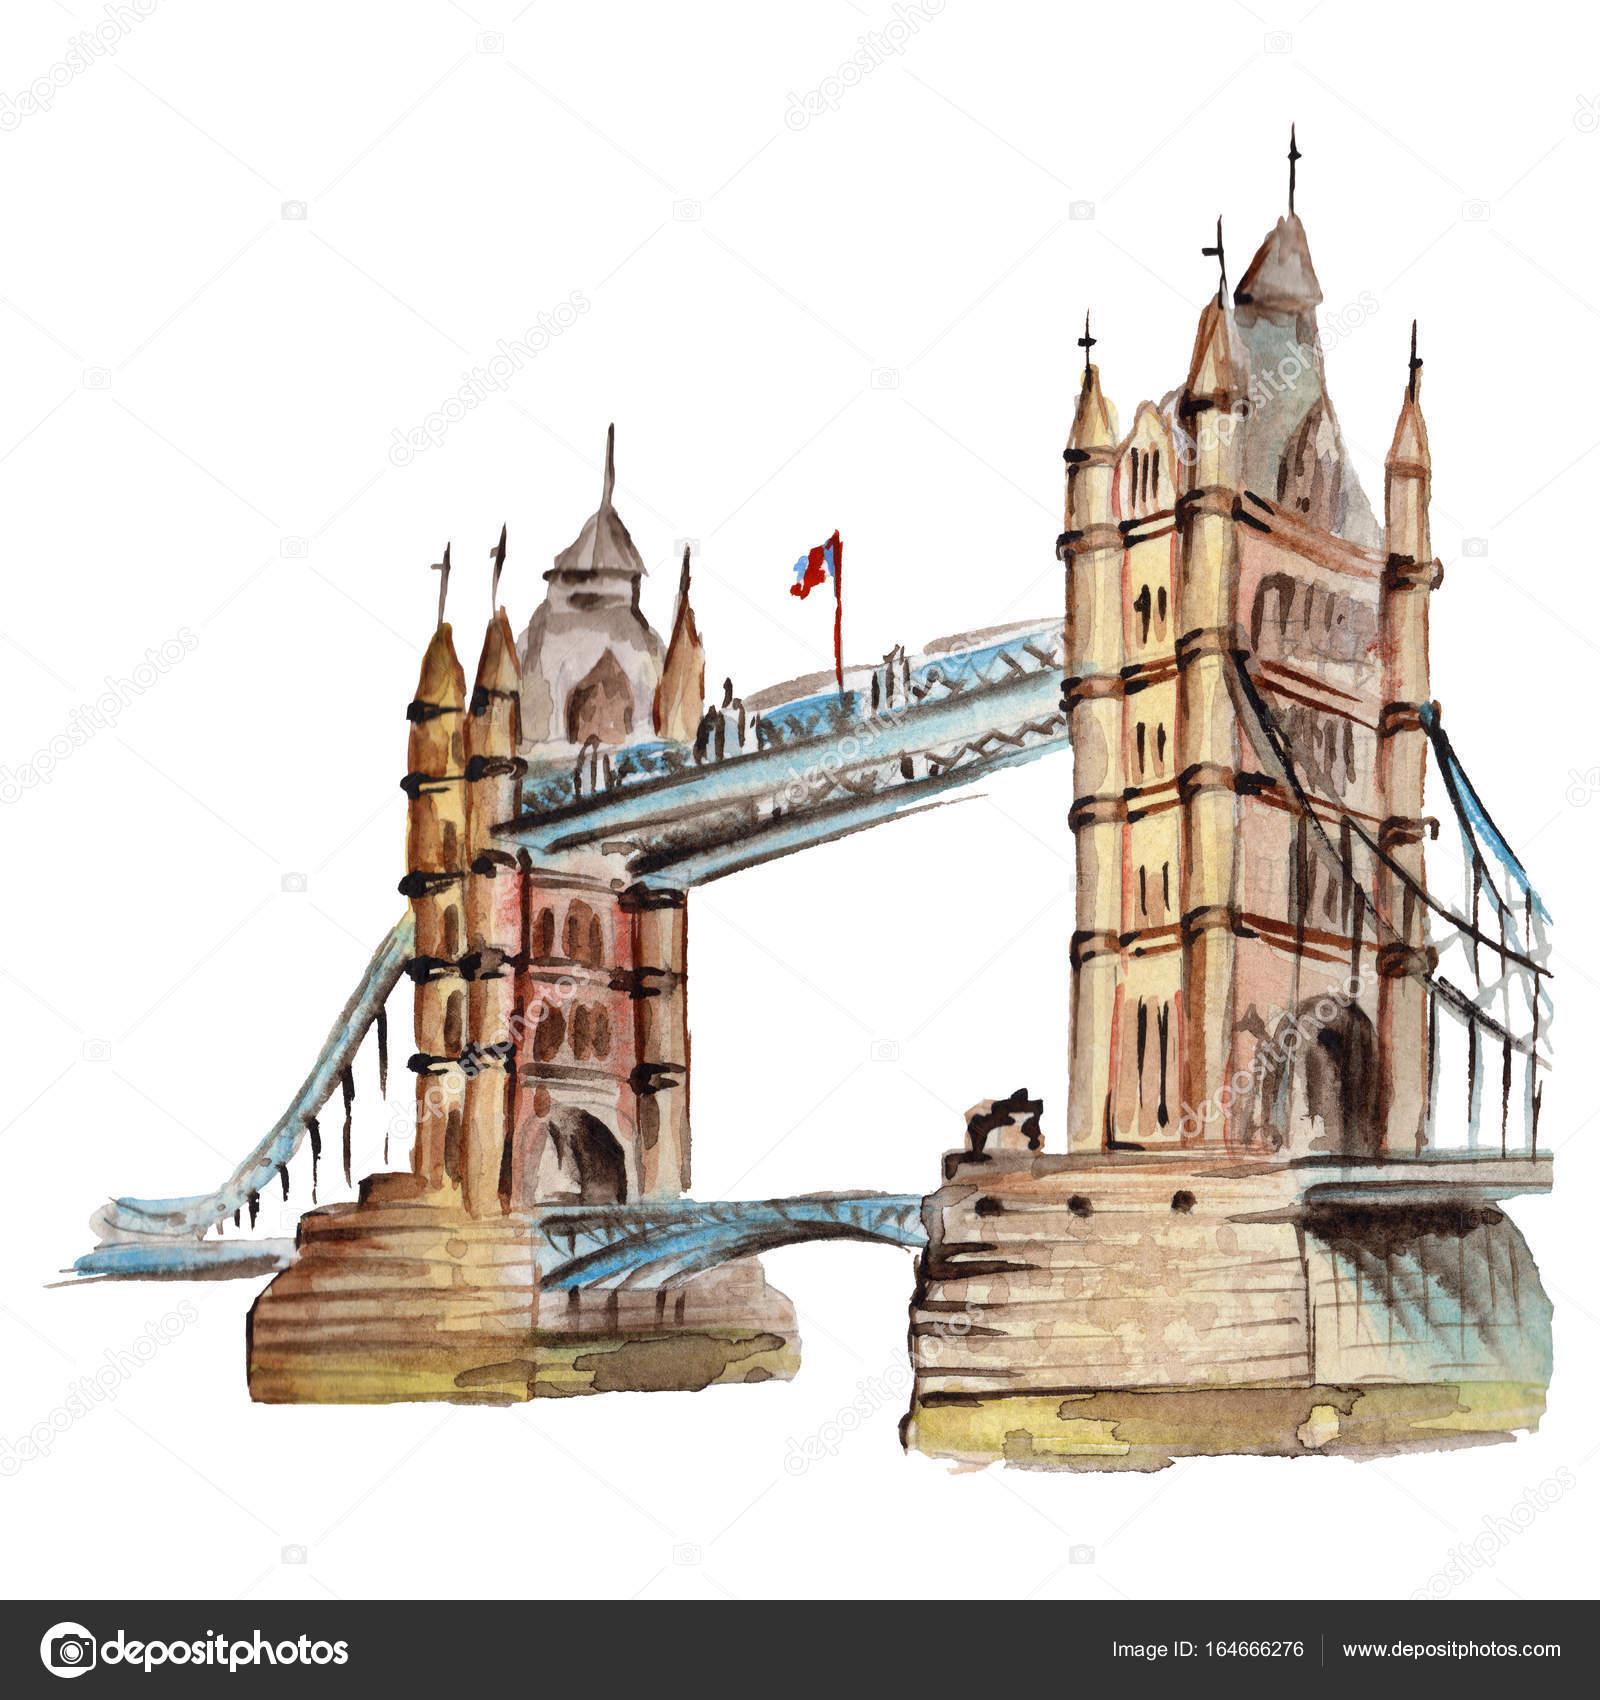 Watercolor london illustration great britain hand drawn symbols watercolor london illustration great britain hand drawn symbols stock photo biocorpaavc